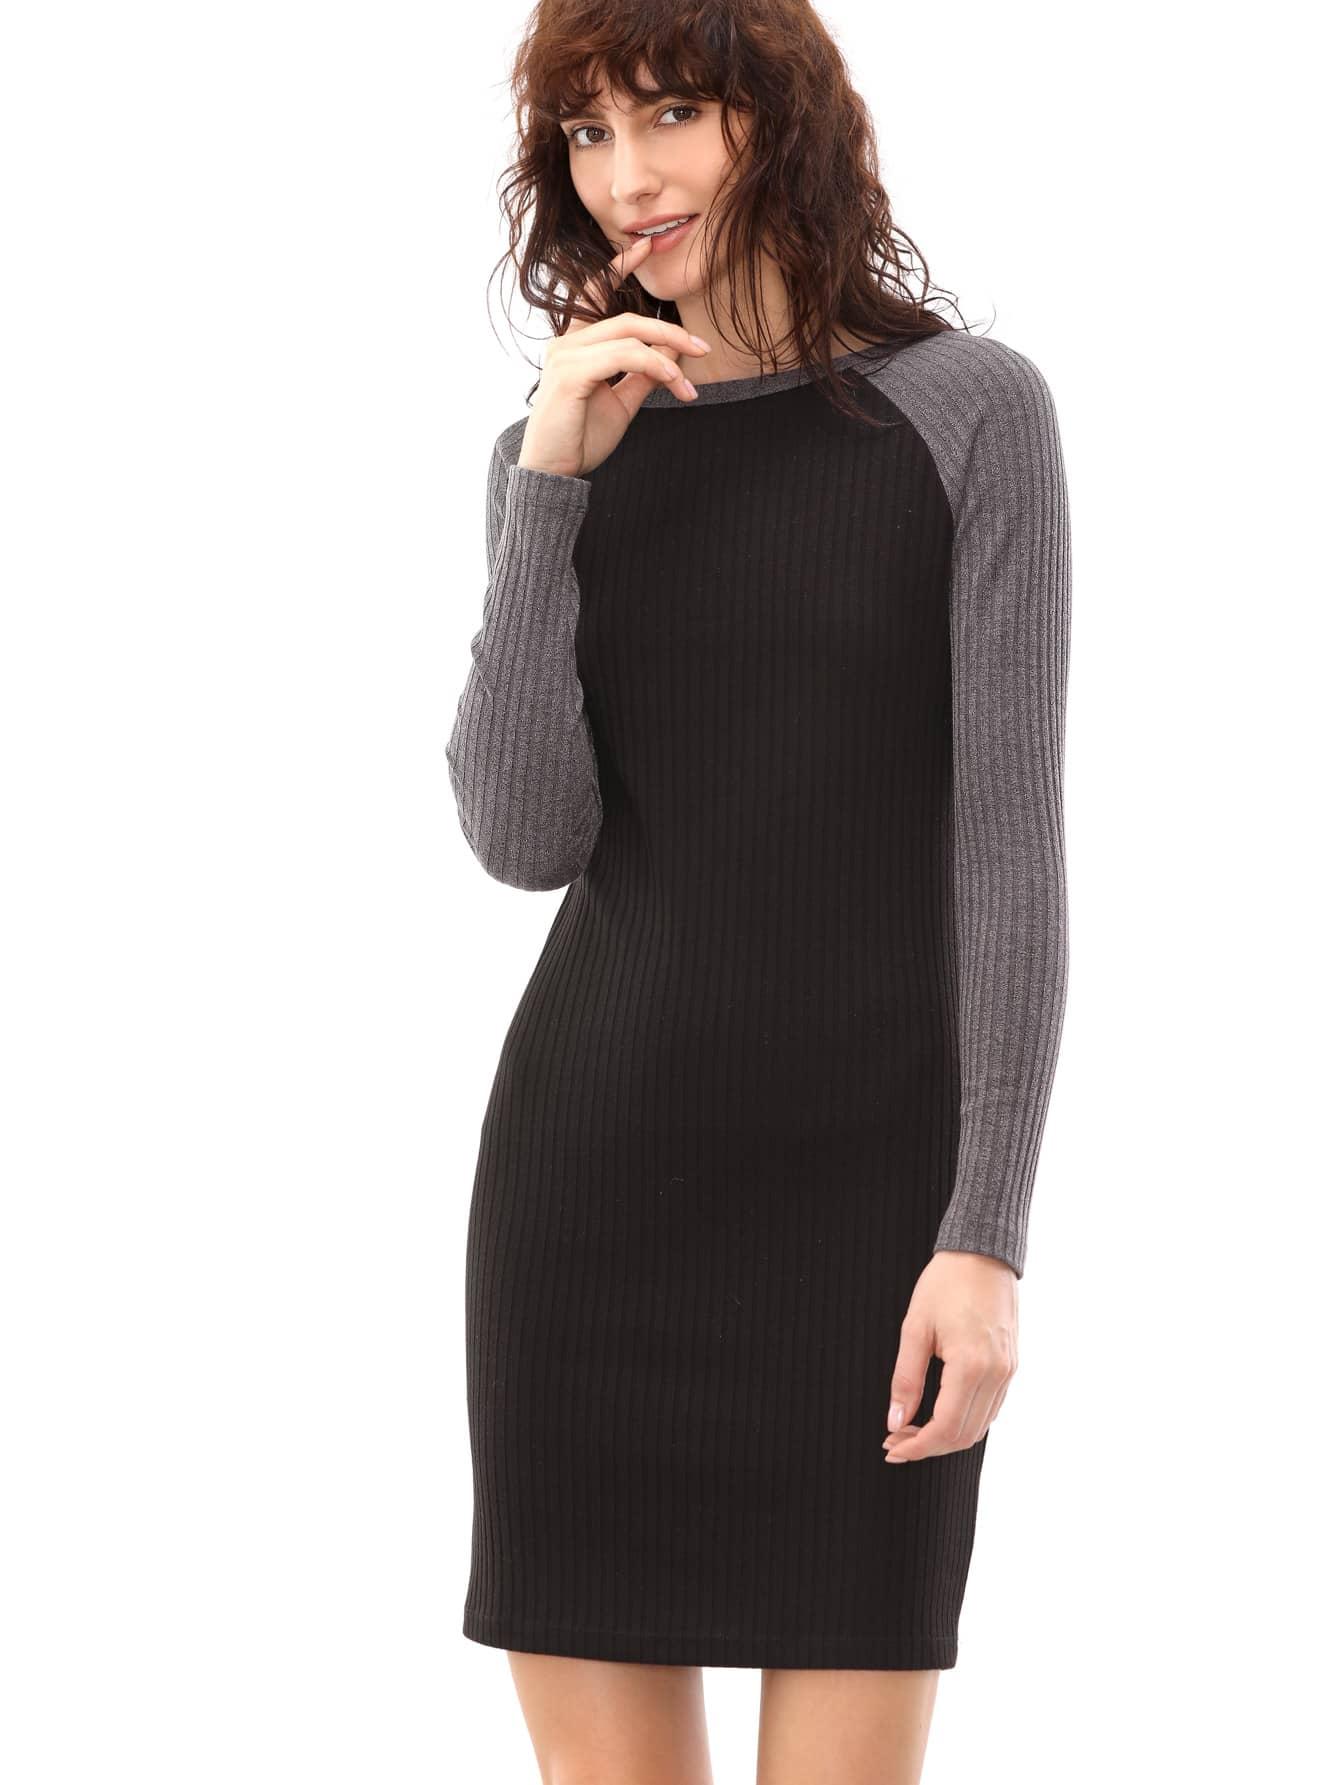 Фото Black Ribbed Knit Contrast Raglan Sleeve Sheath Dress. Купить с доставкой